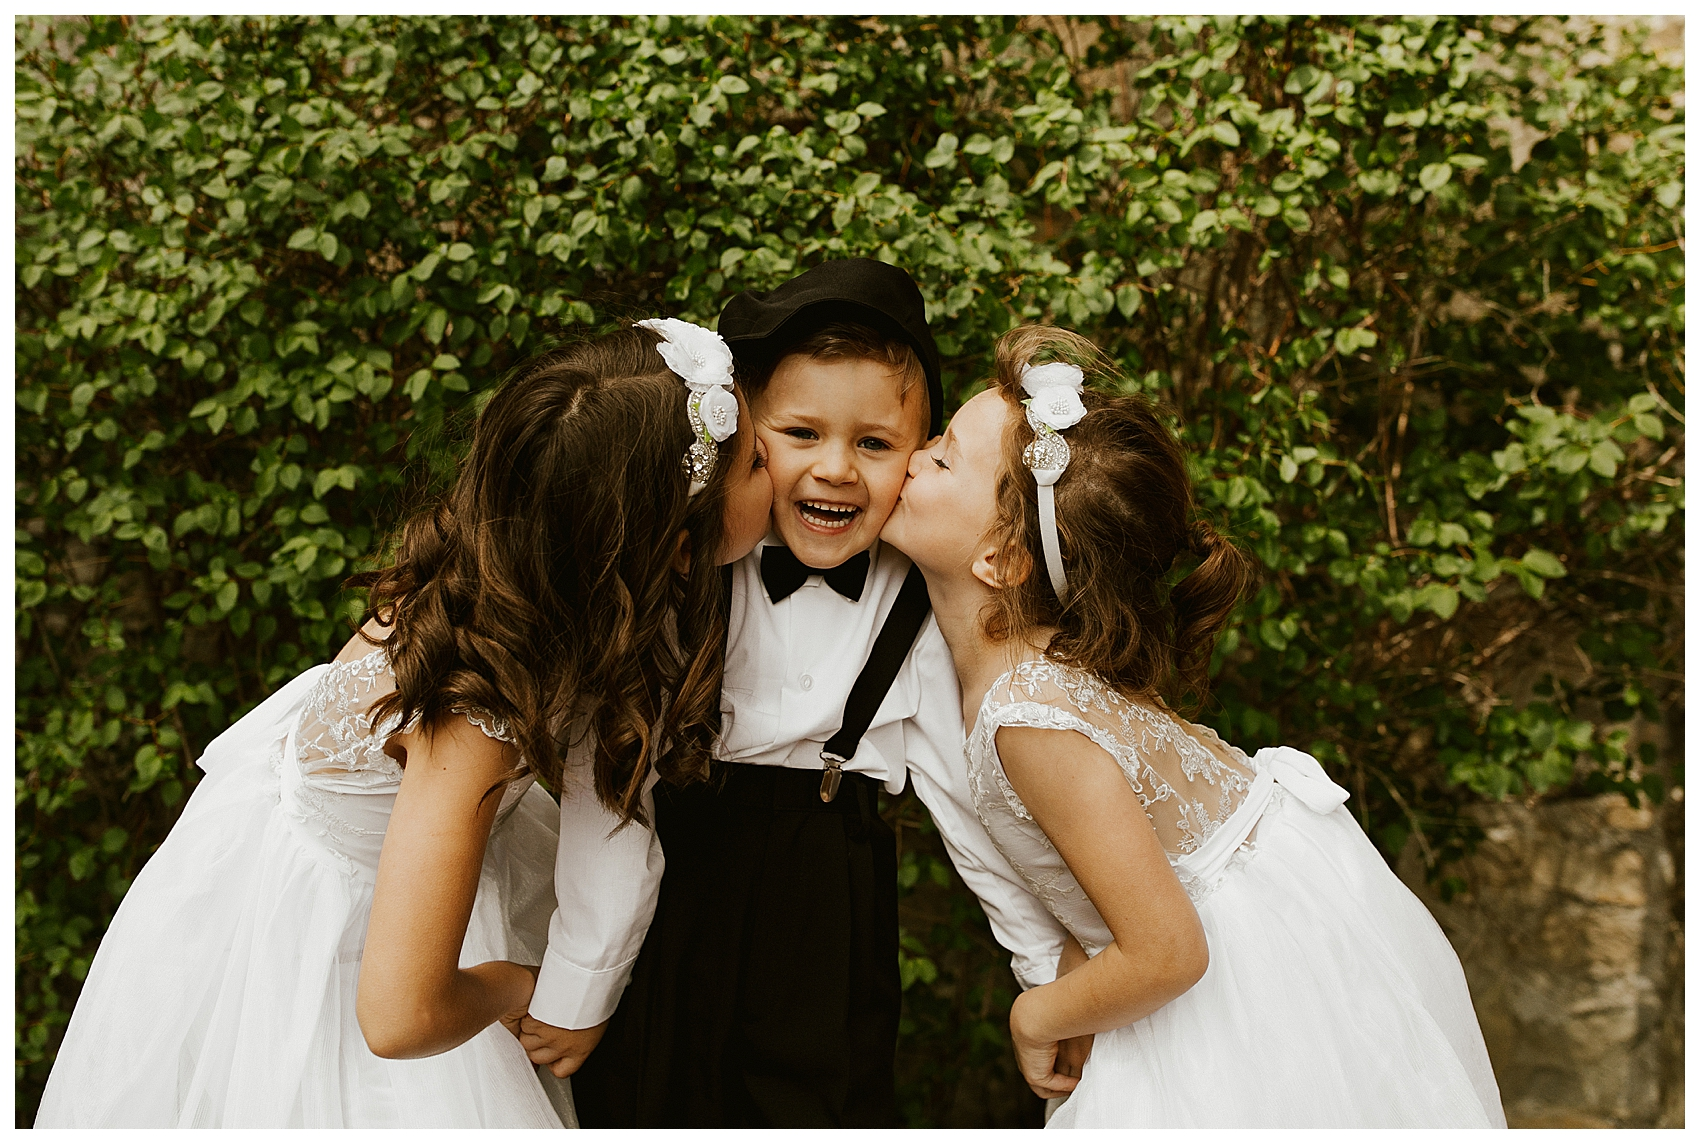 Chateau Rive Spokane Wedding Cassie Trottier Photography01031.jpg